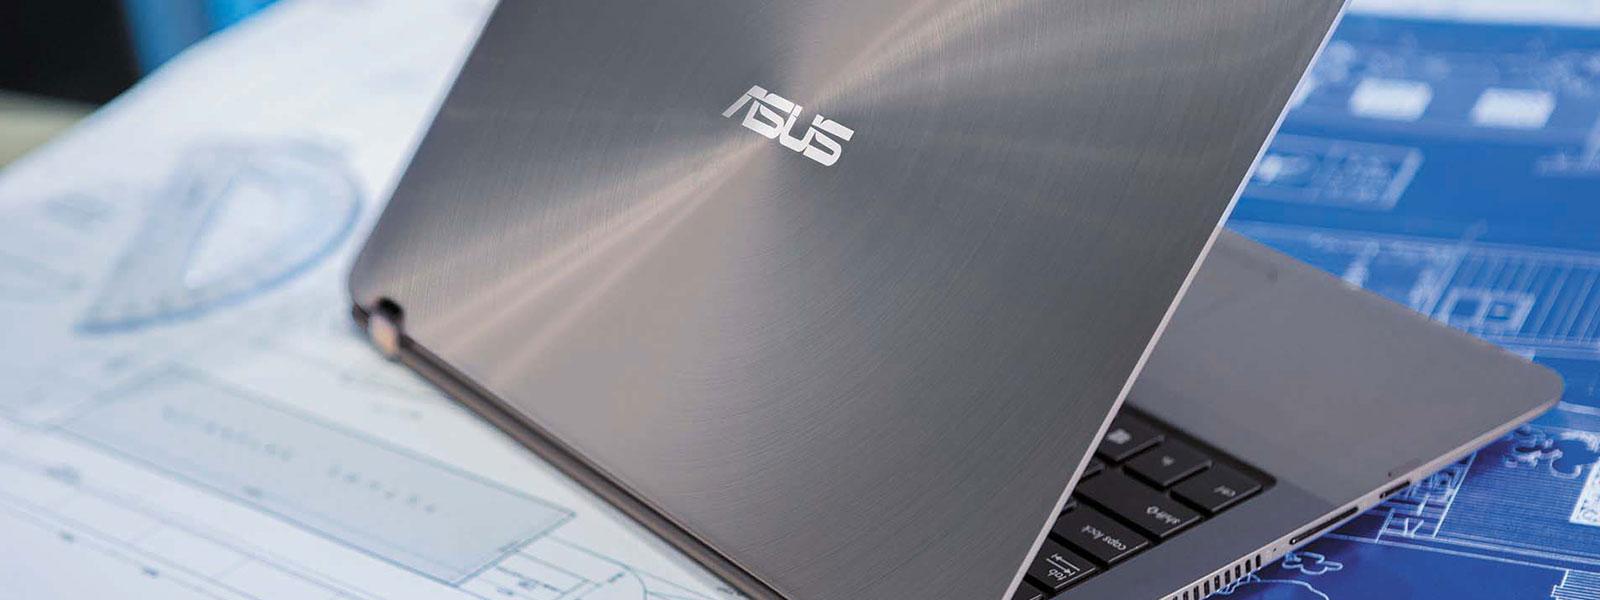 The ASUS Zenbook Flip UX360UA on a desk.